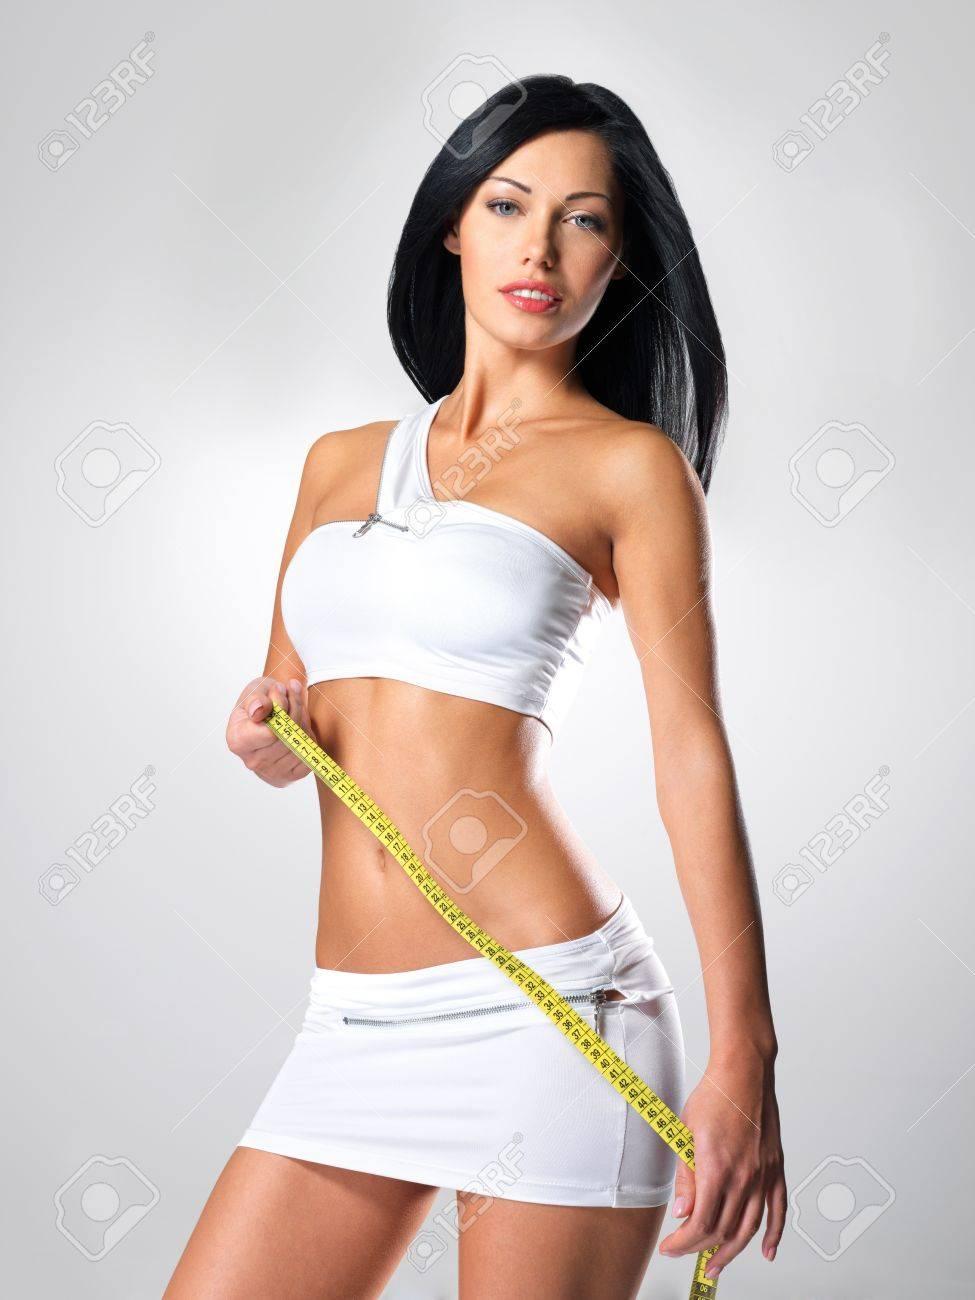 Sporty beautiful woman with measure tape - studio shot Stock Photo - 16642970